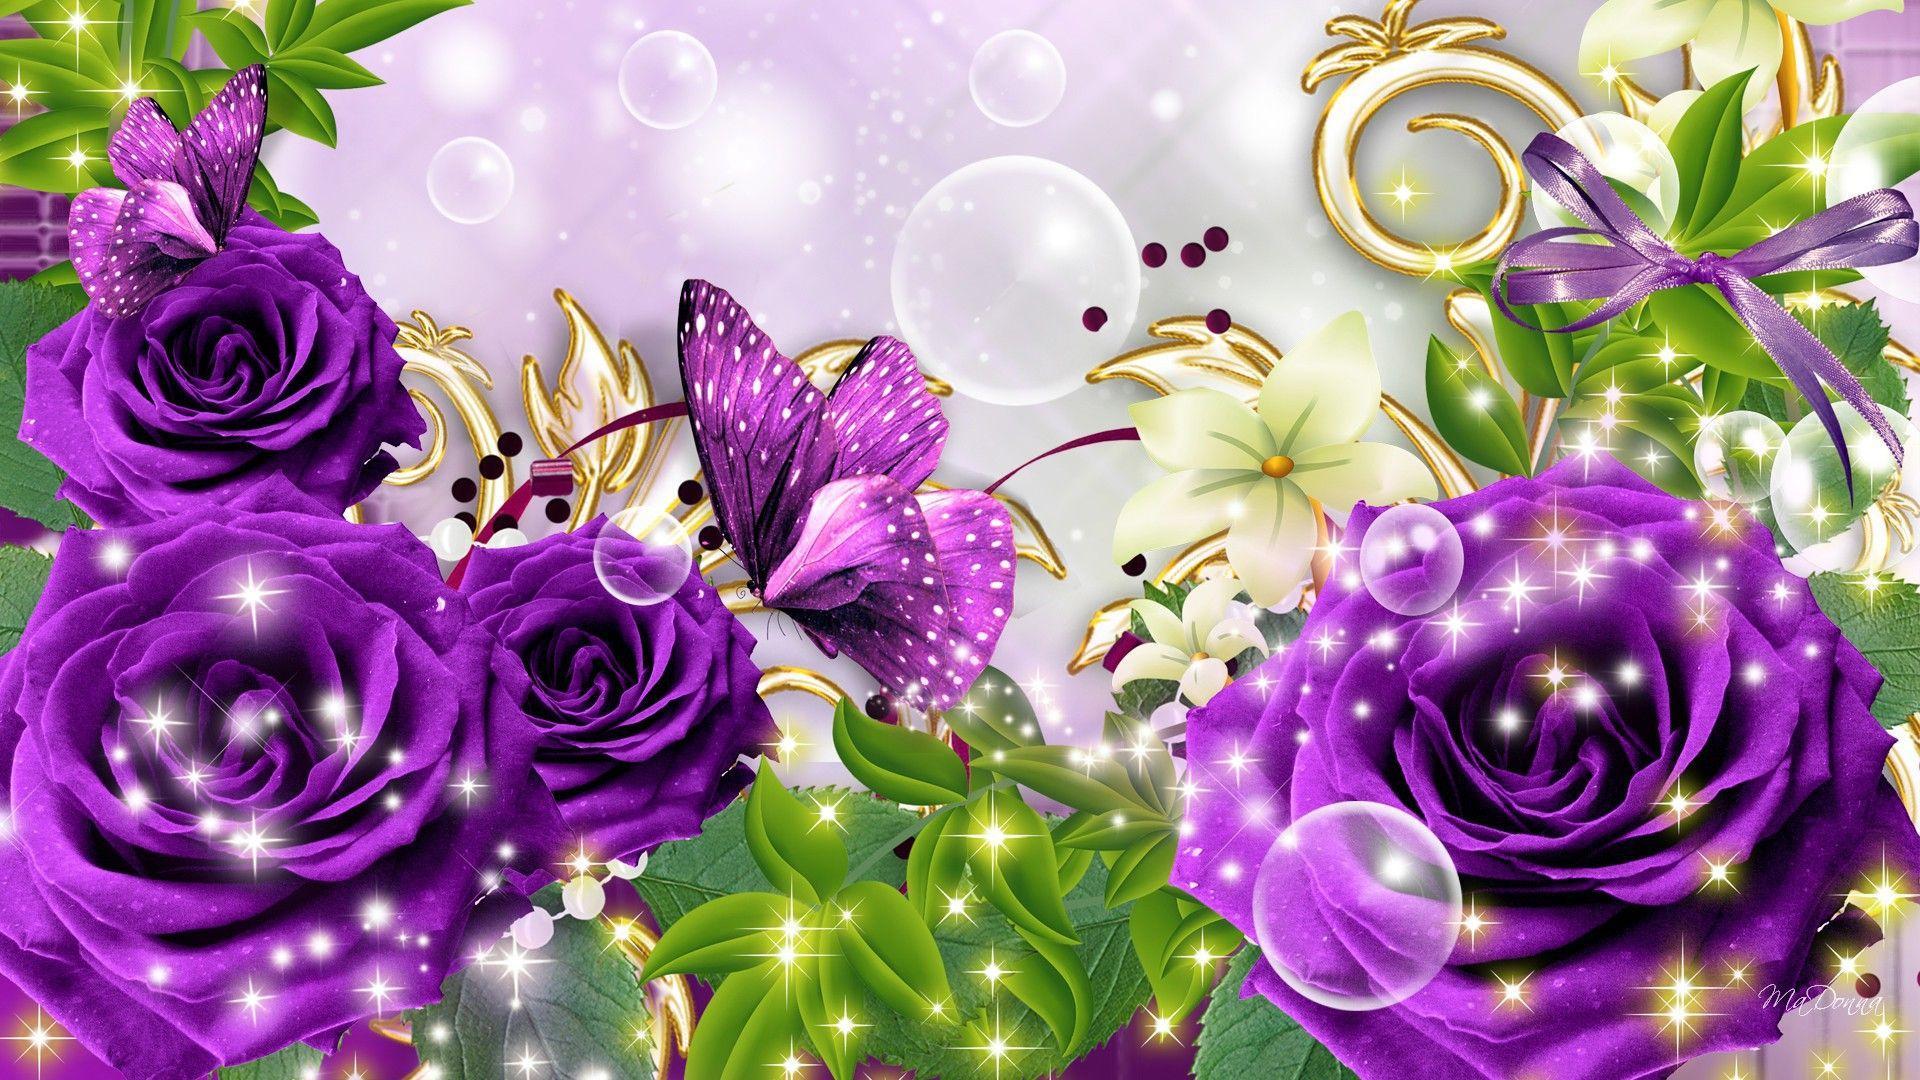 Glitter Flower Wallpapers - Wallpaper Cave